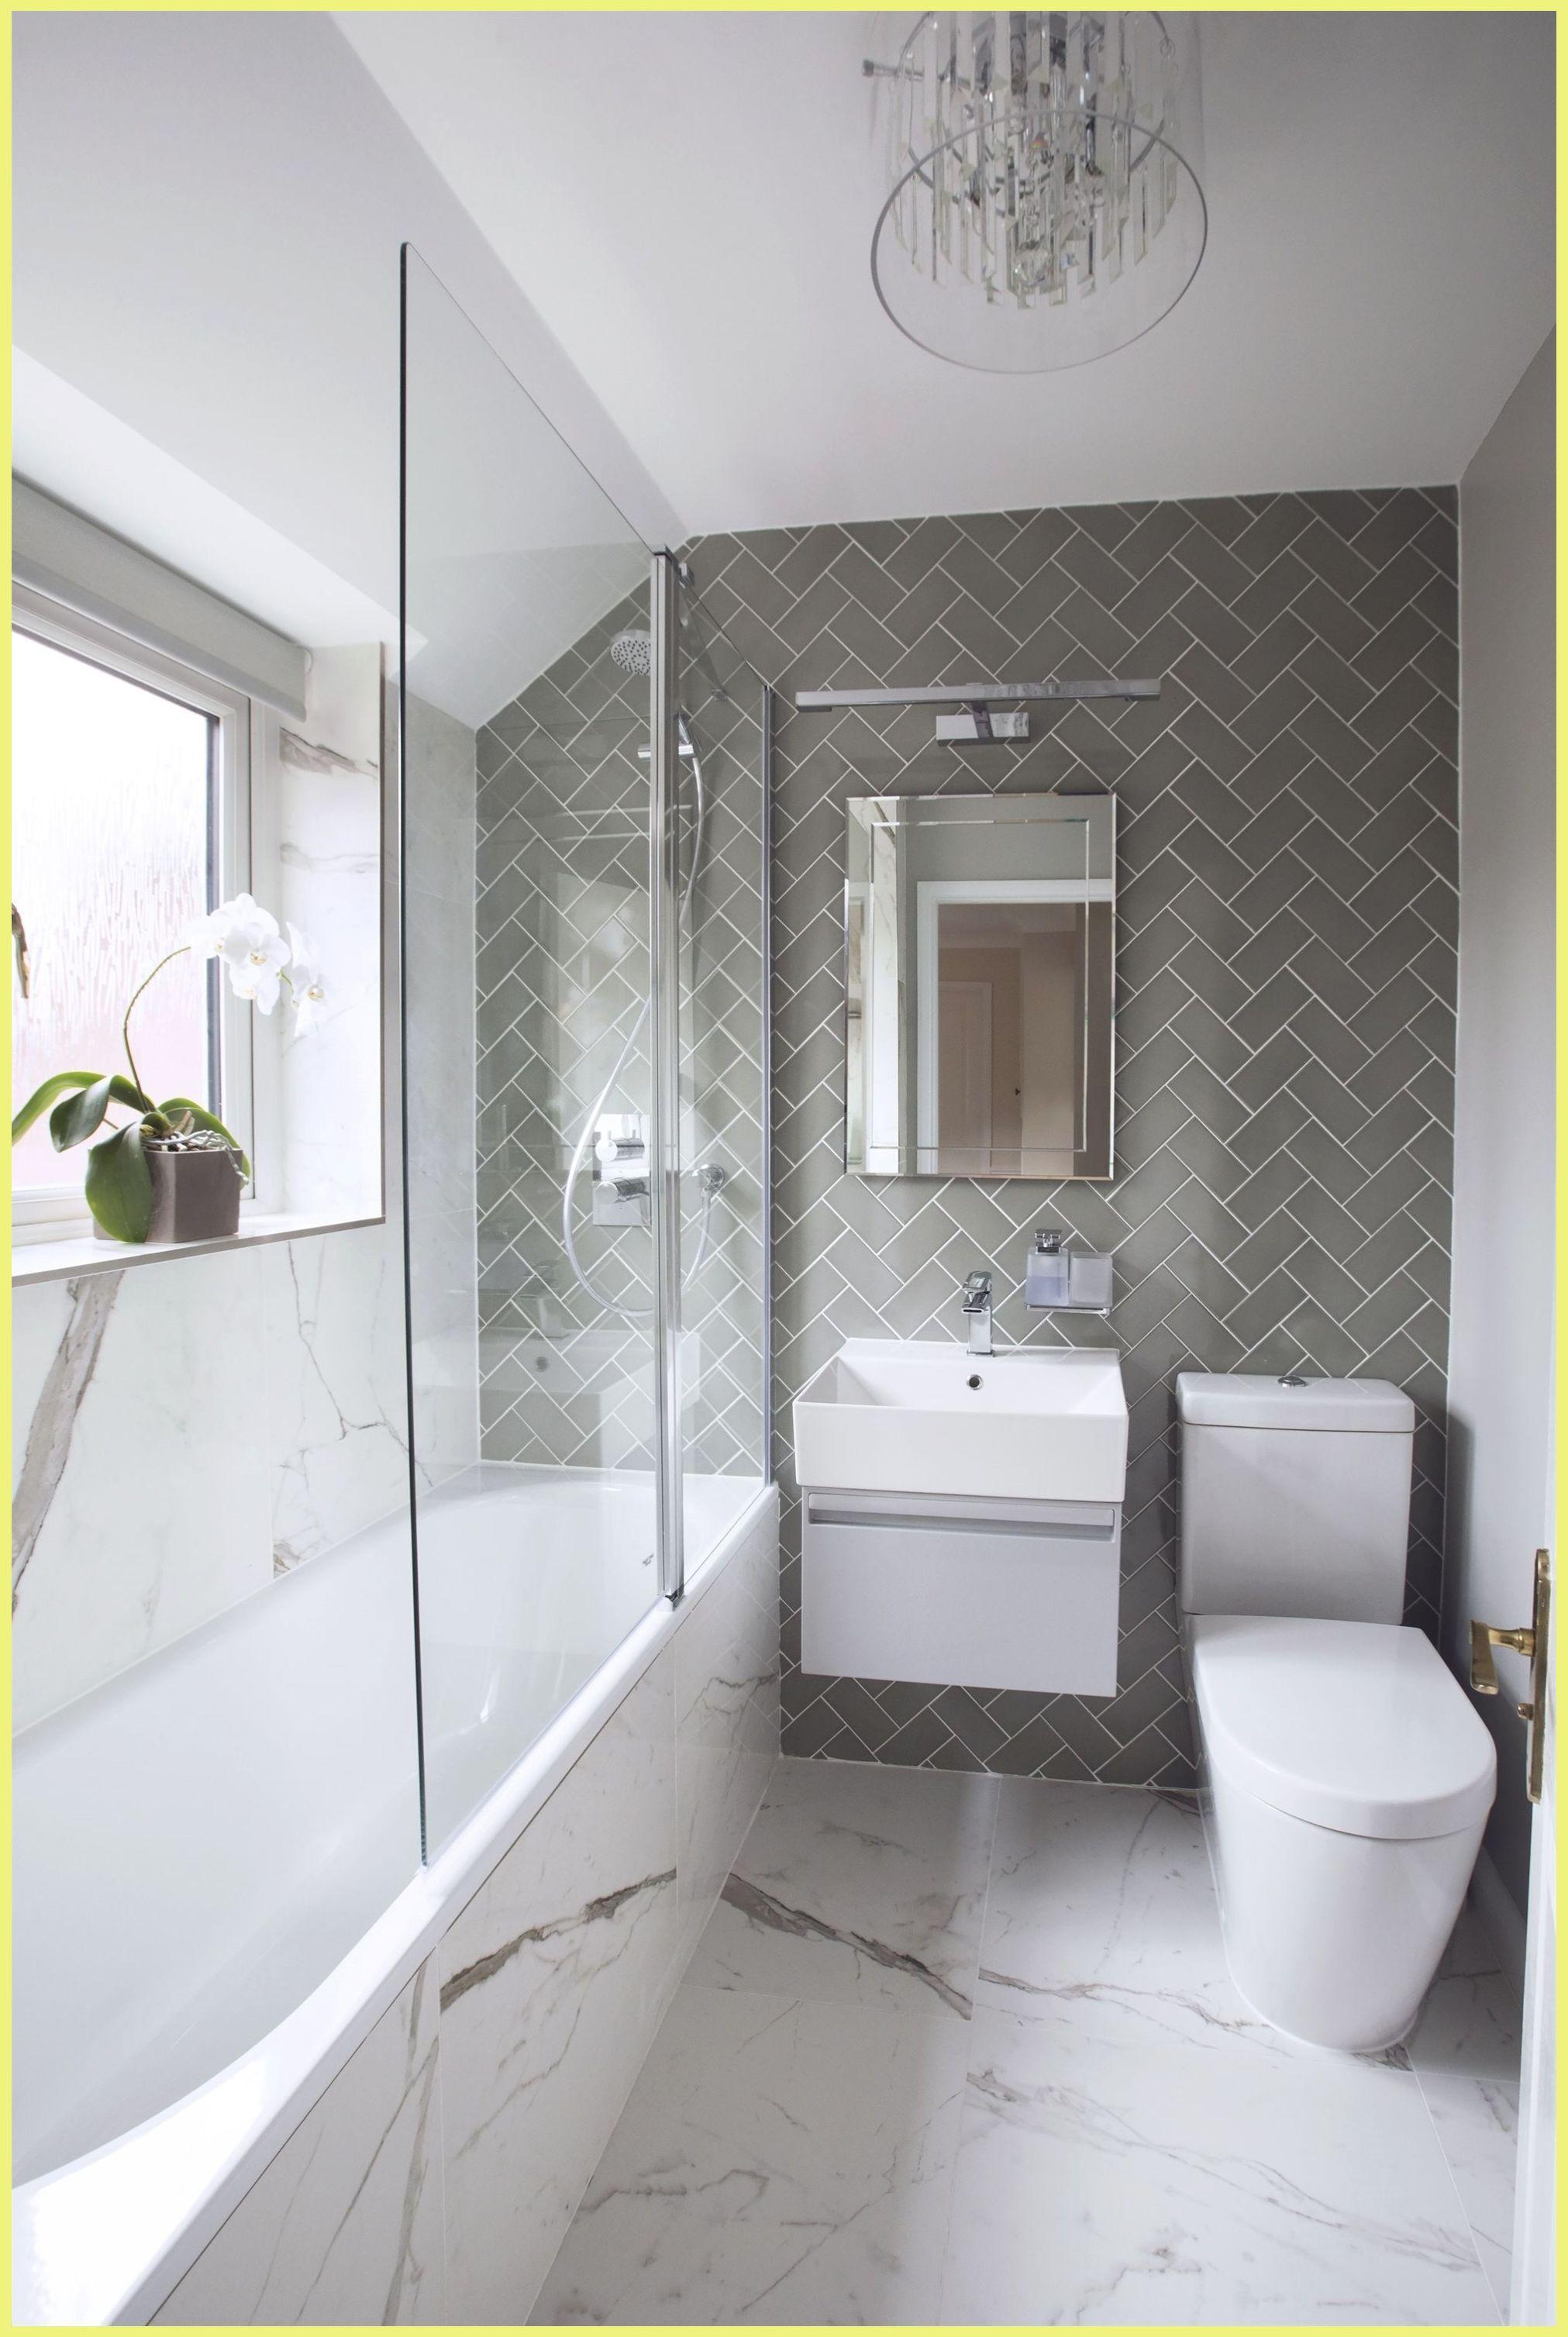 26 Gray Bathroom Ideas Worthy Of Your Experiments Small Bathroom Ideas With Tub Renovati Bathroom Layout Small Bathroom Small Bathroom Remodel